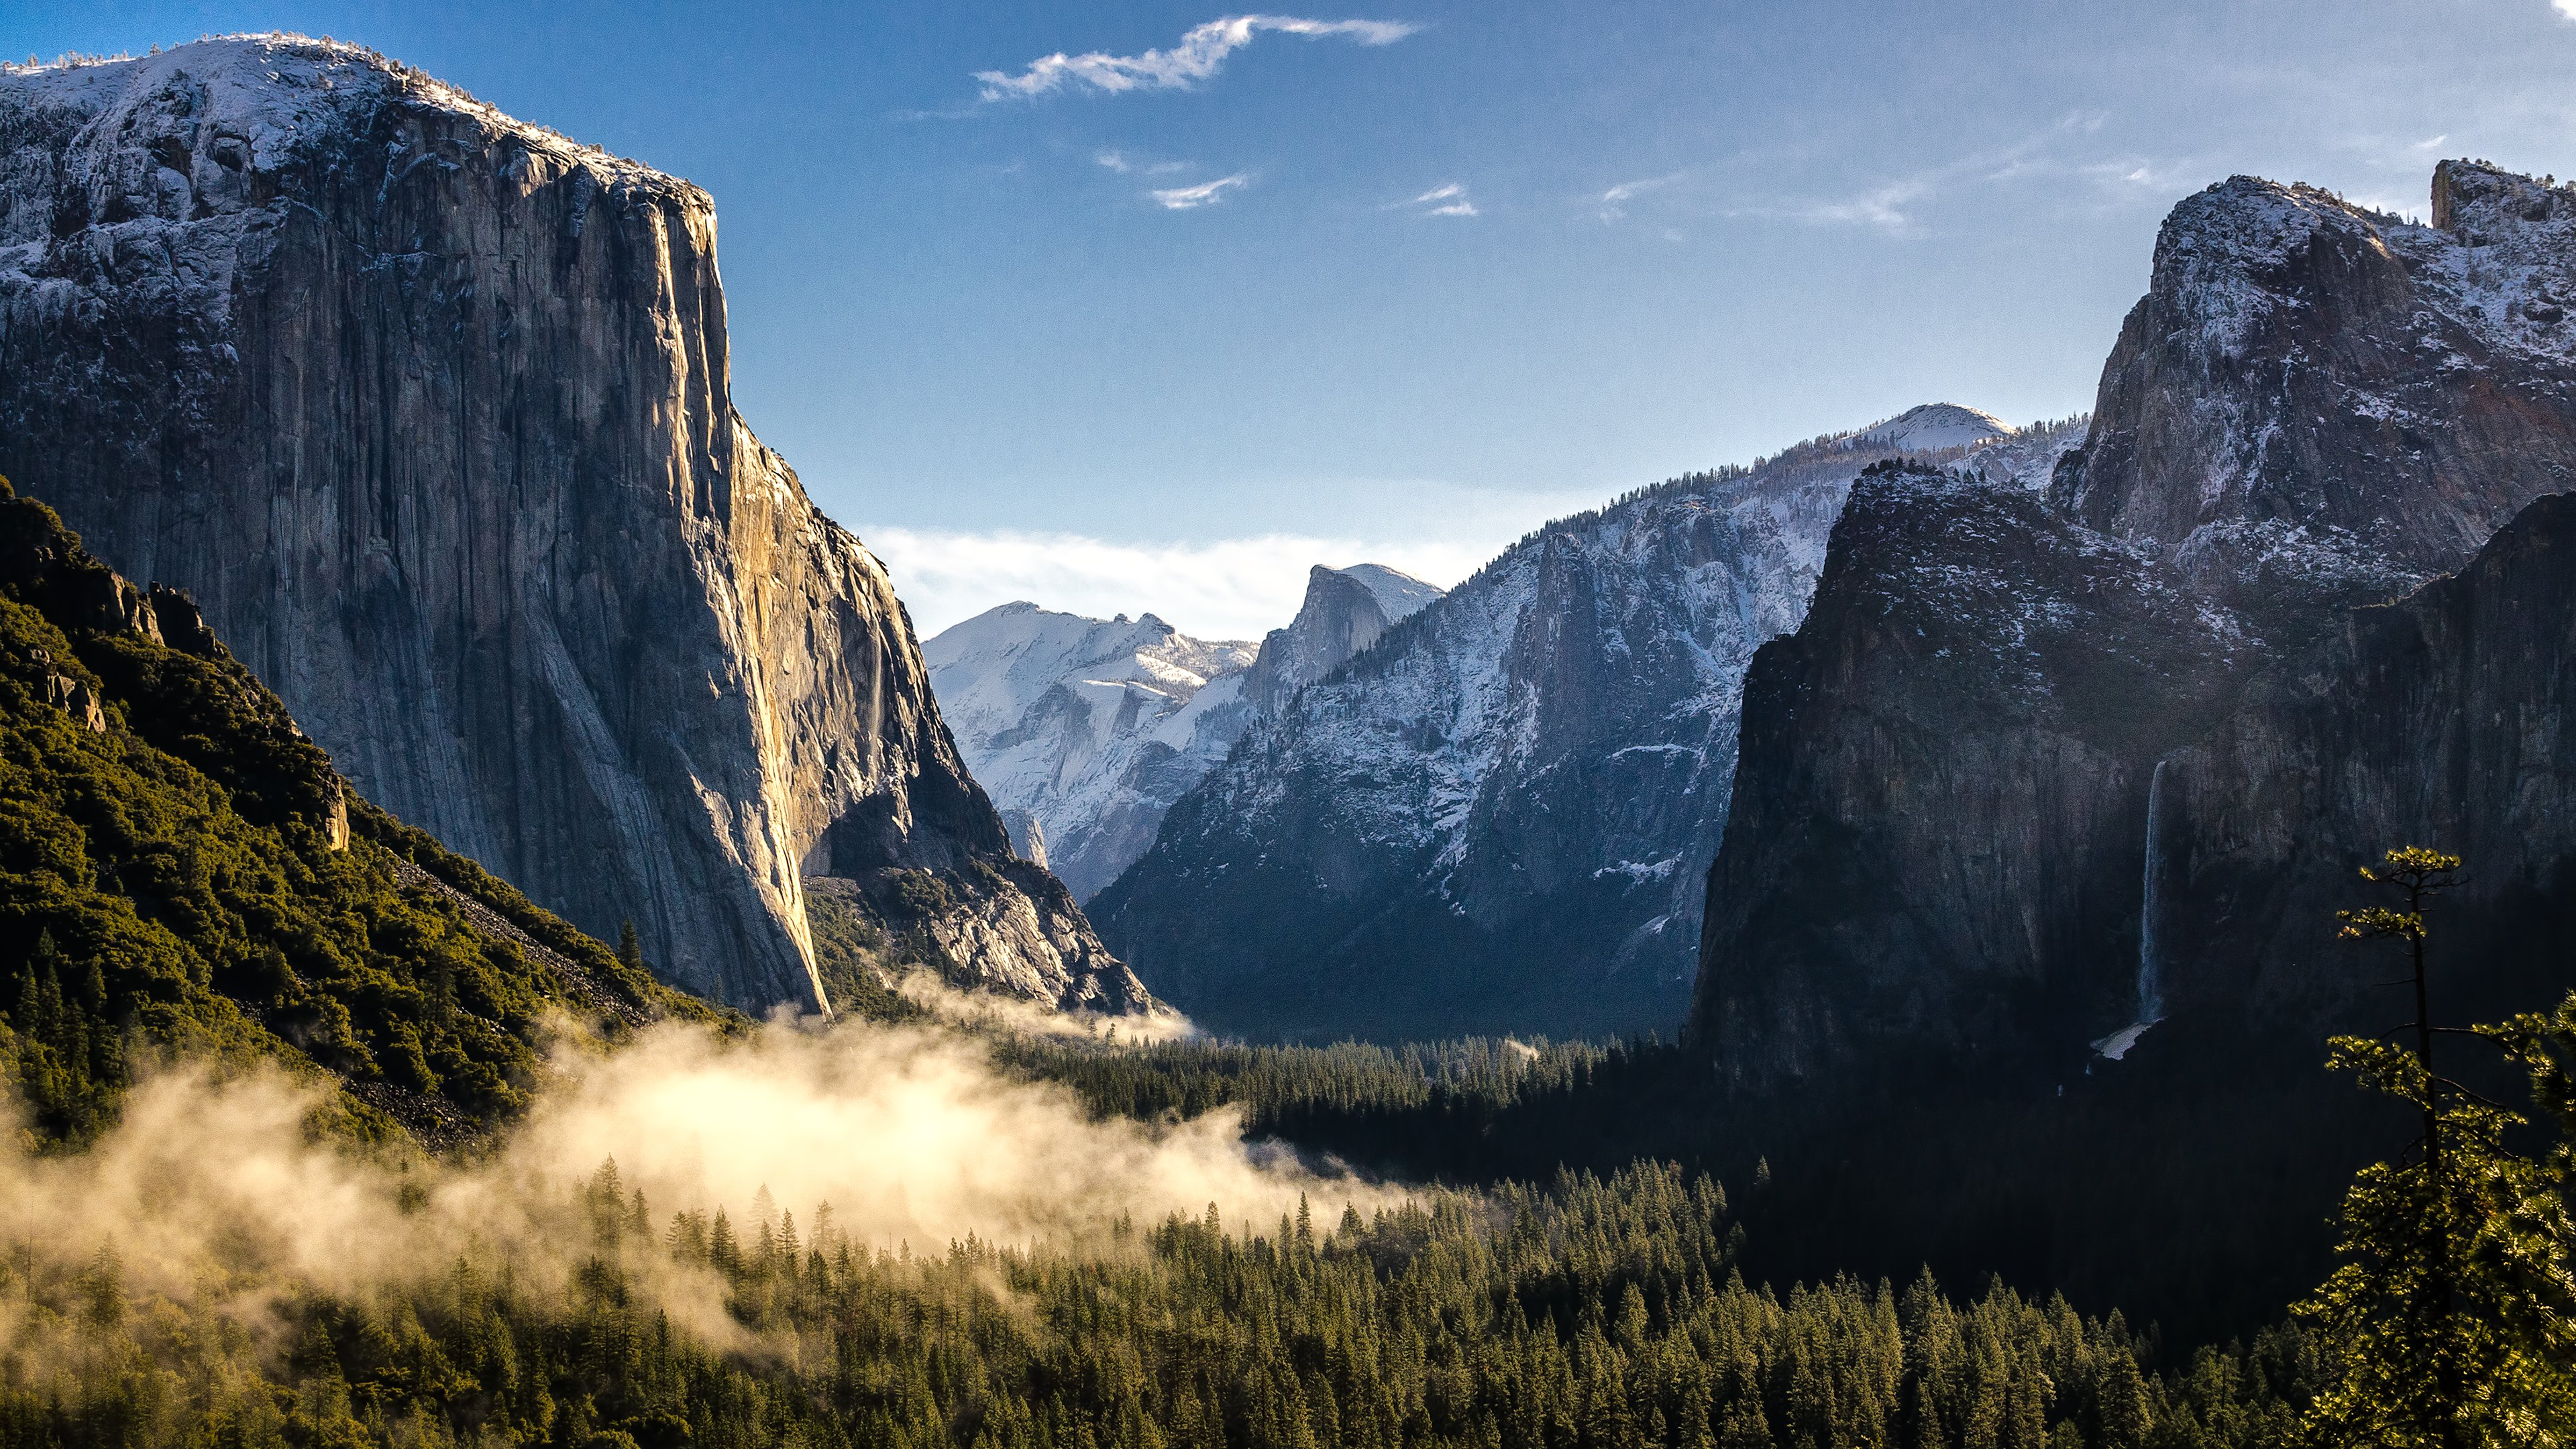 Mac Os Yosemite Wallpaper 4k Download